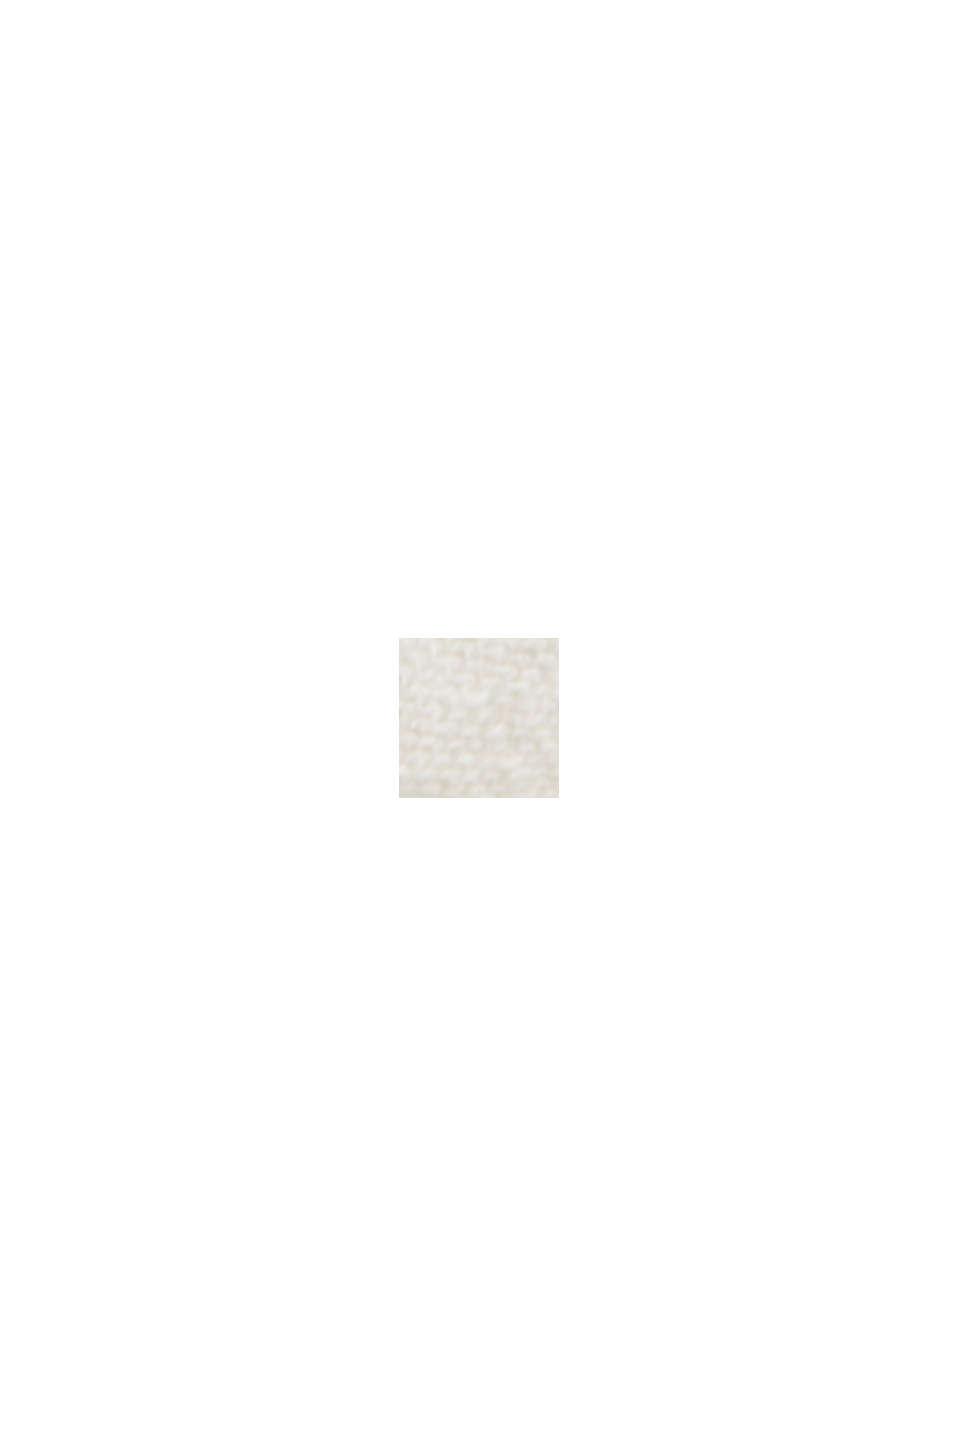 Leinen/Organic Cotton: V-Neck Cardigan, OFF WHITE, swatch